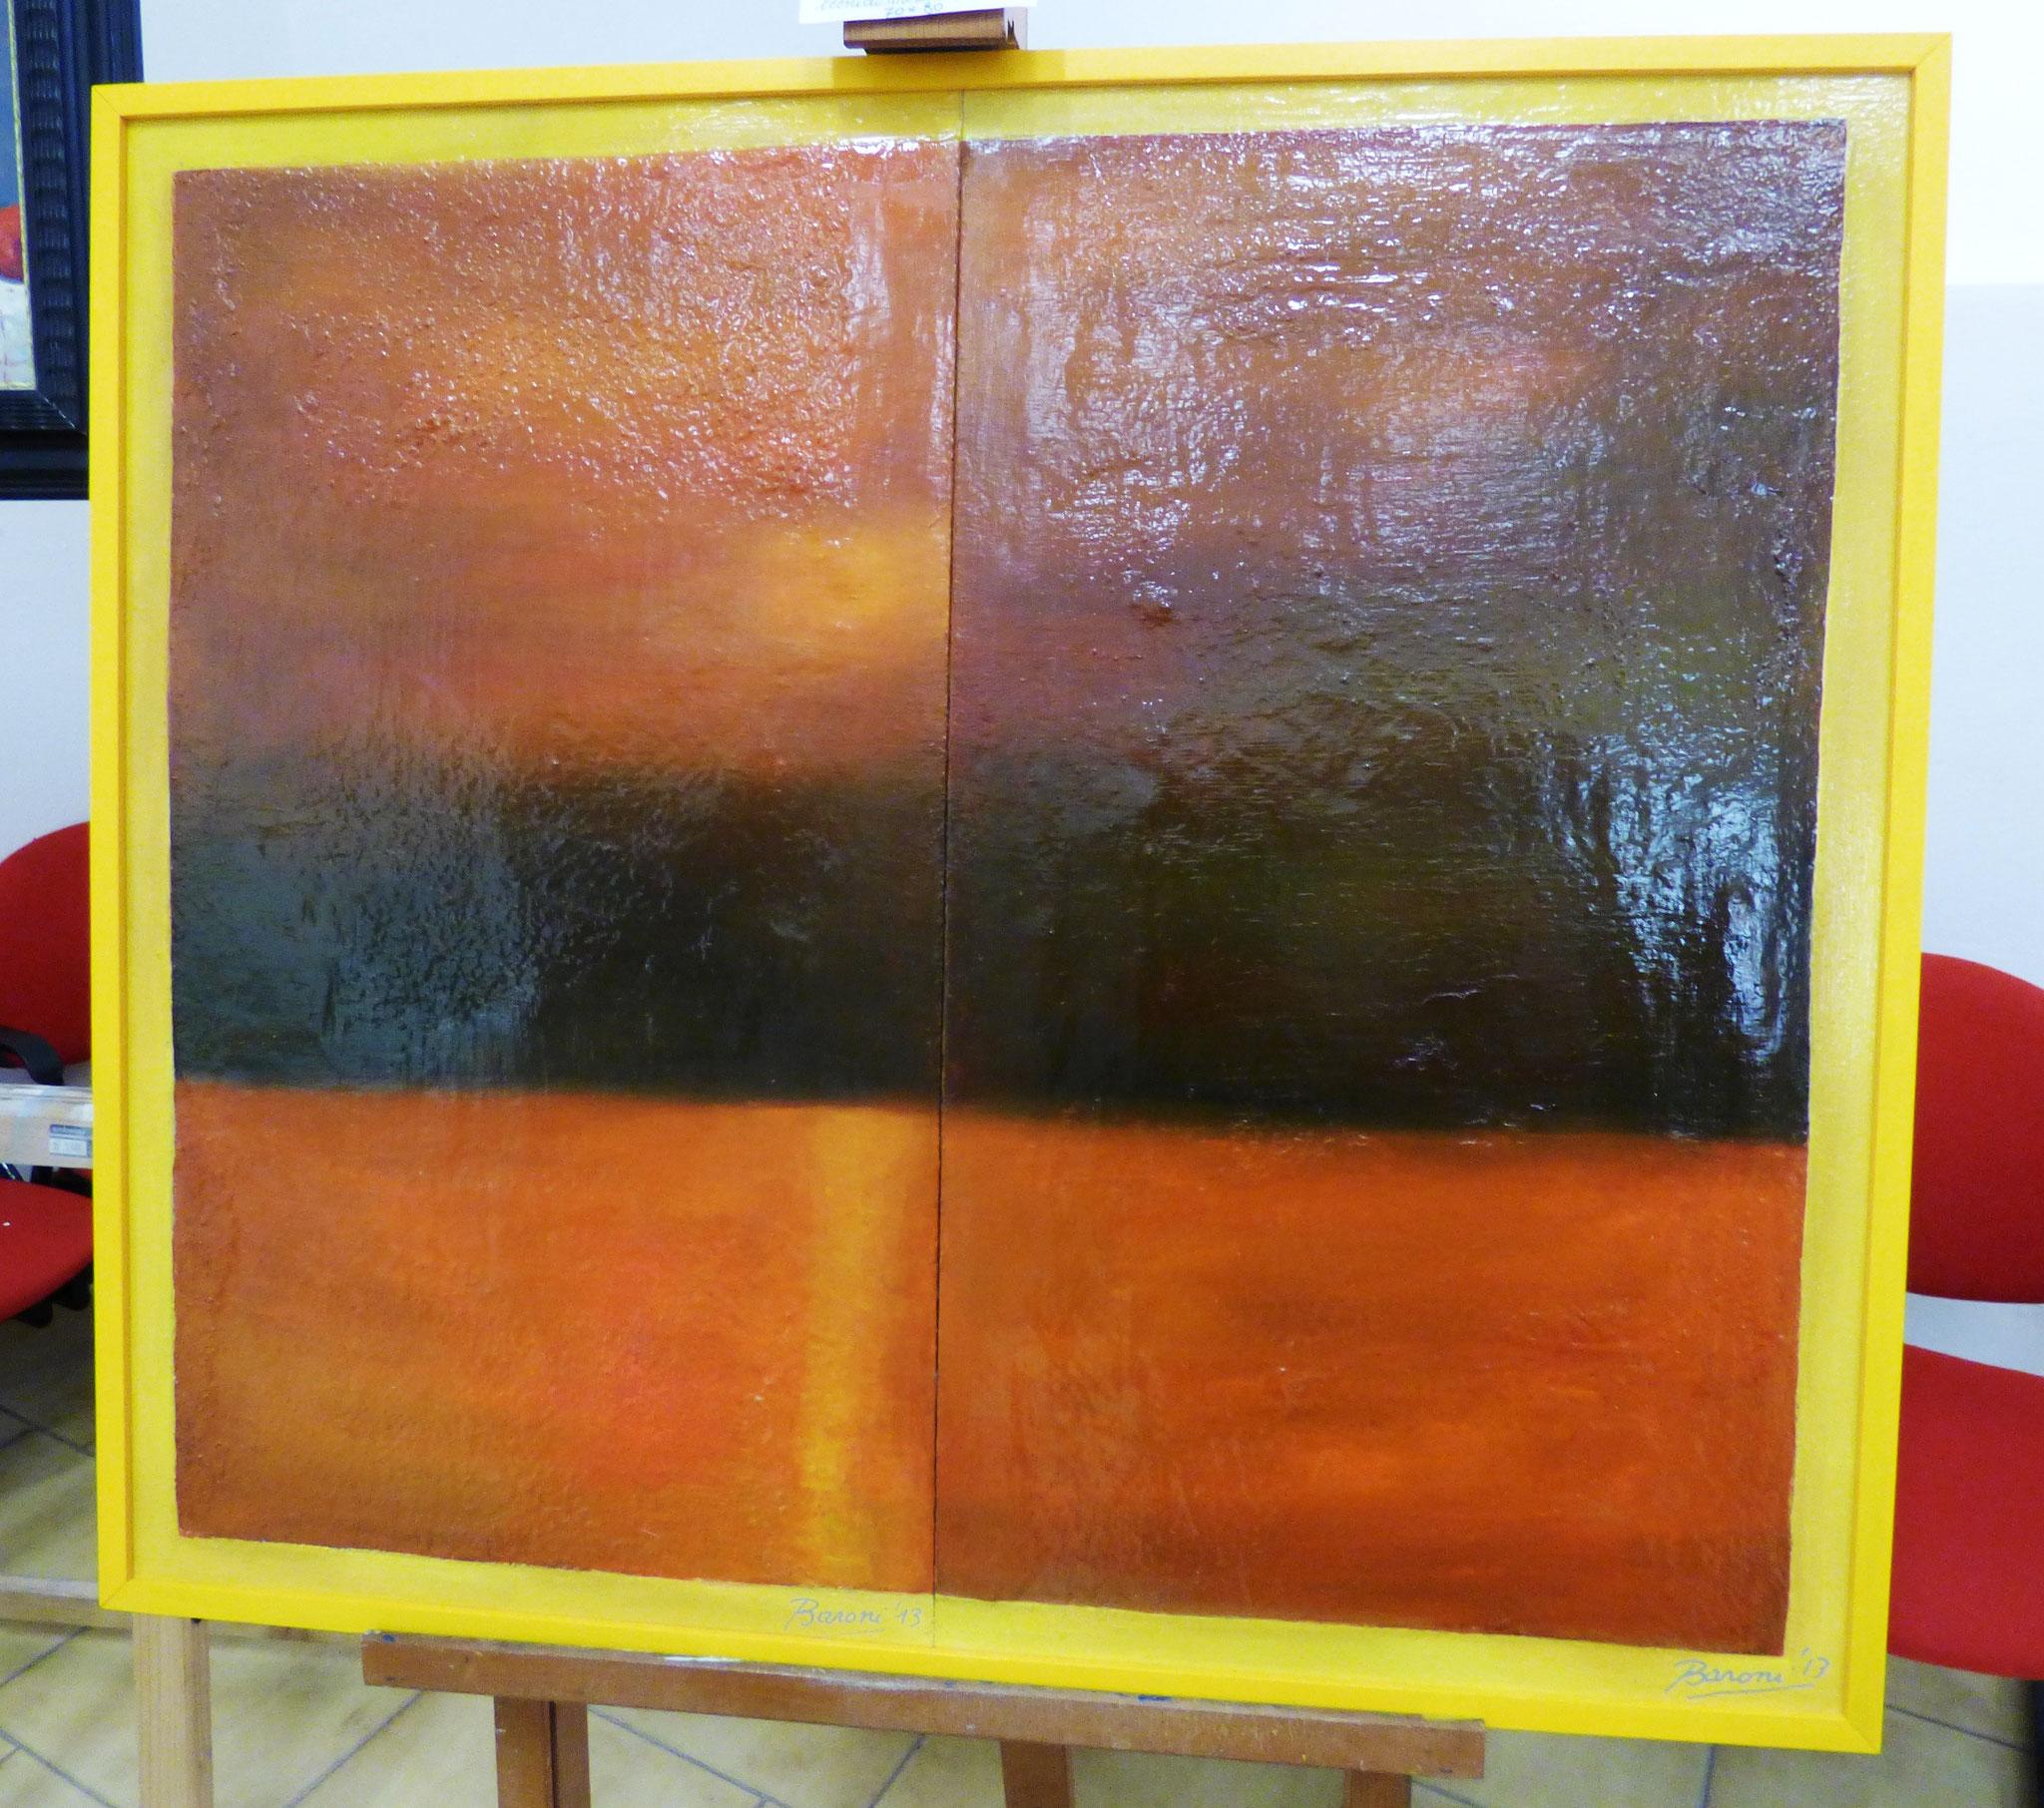 Giuseppe Baroni paesaggio tecnica mista su tavola 70x80